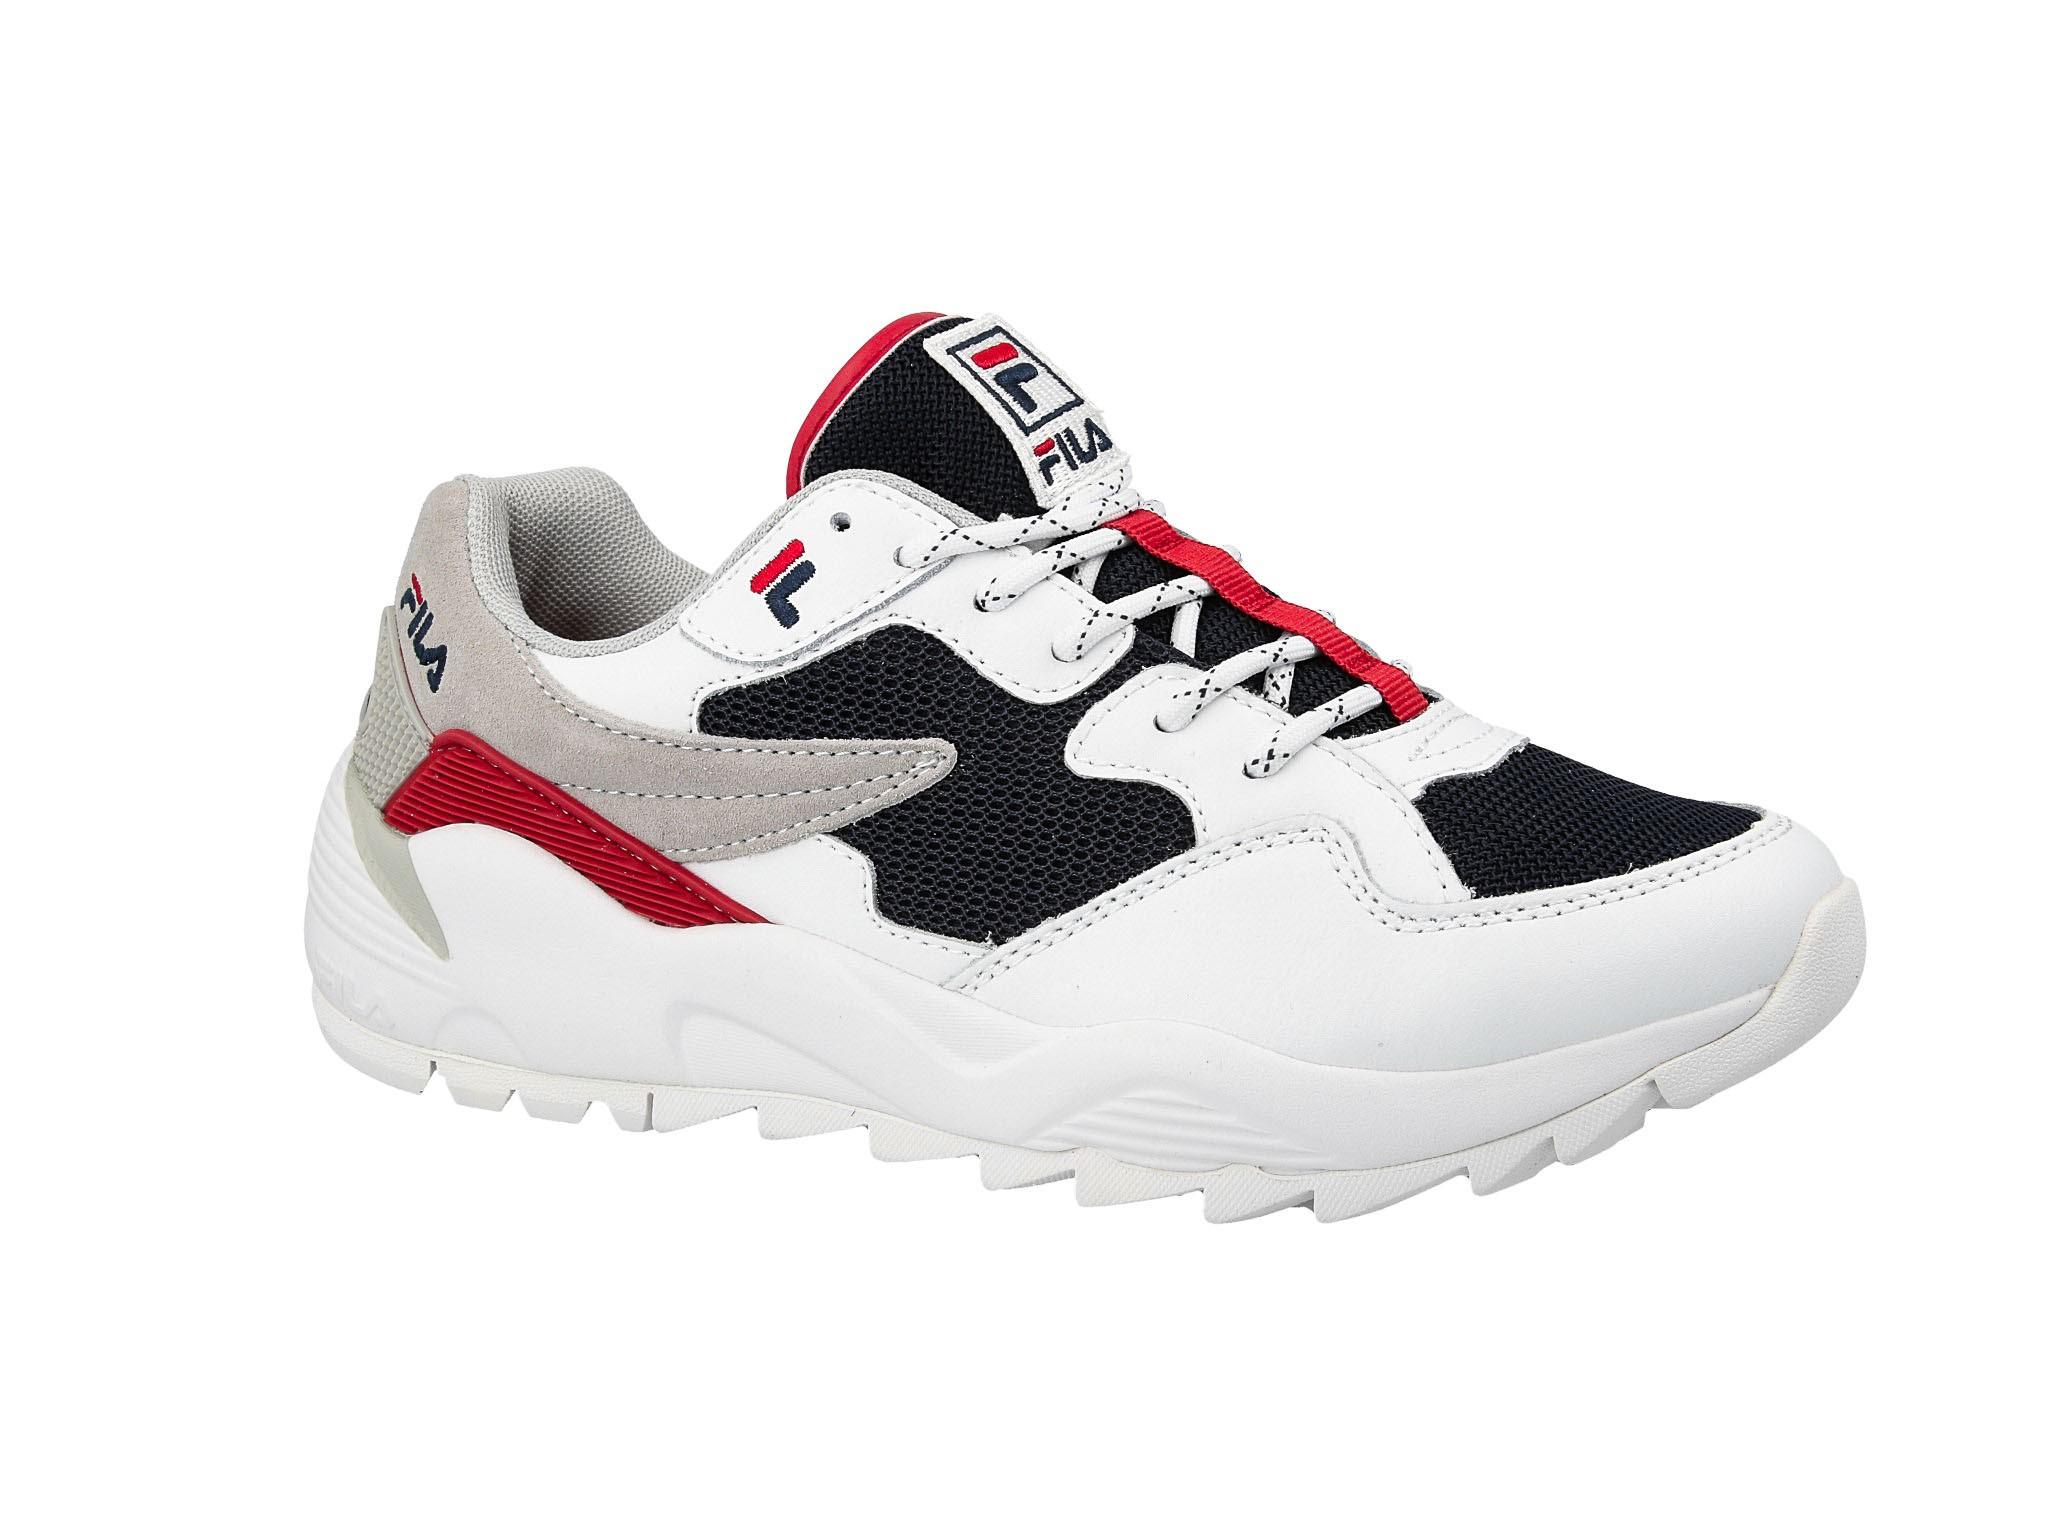 Sneakers FILA Vault Cmr Jogger Cb Low 1010588.90Z Whitecap GrayChipmunk